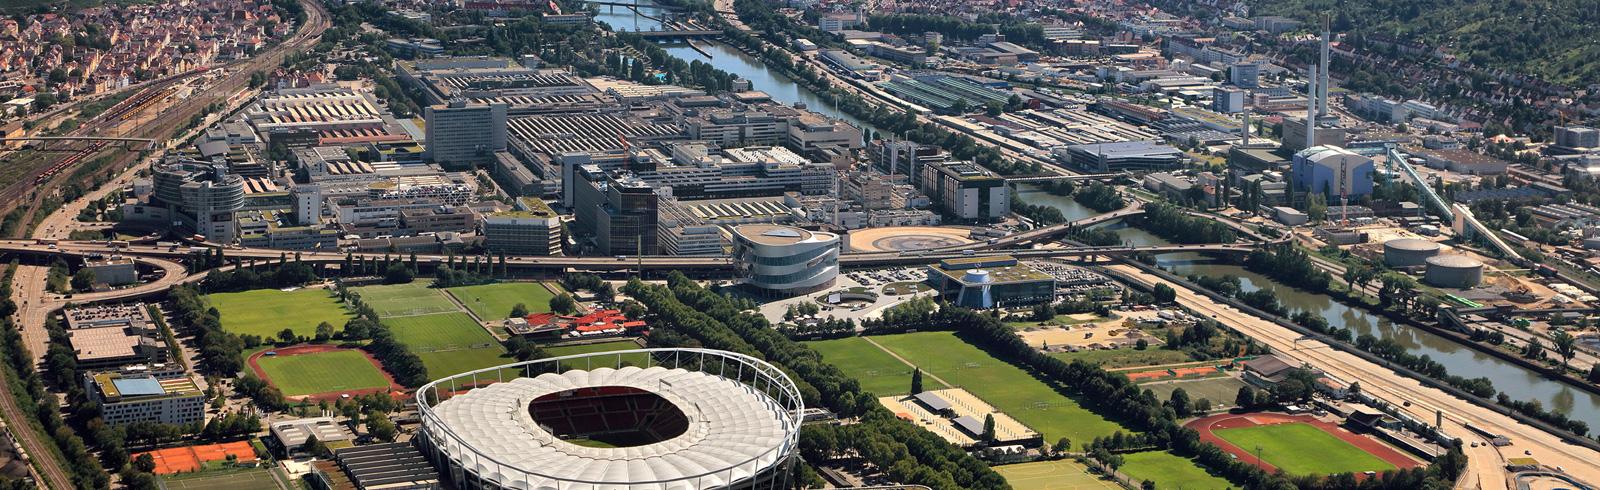 Mercedes-Benz will make its Stuttgart-Untertürkheim an Electric Drive System Campus